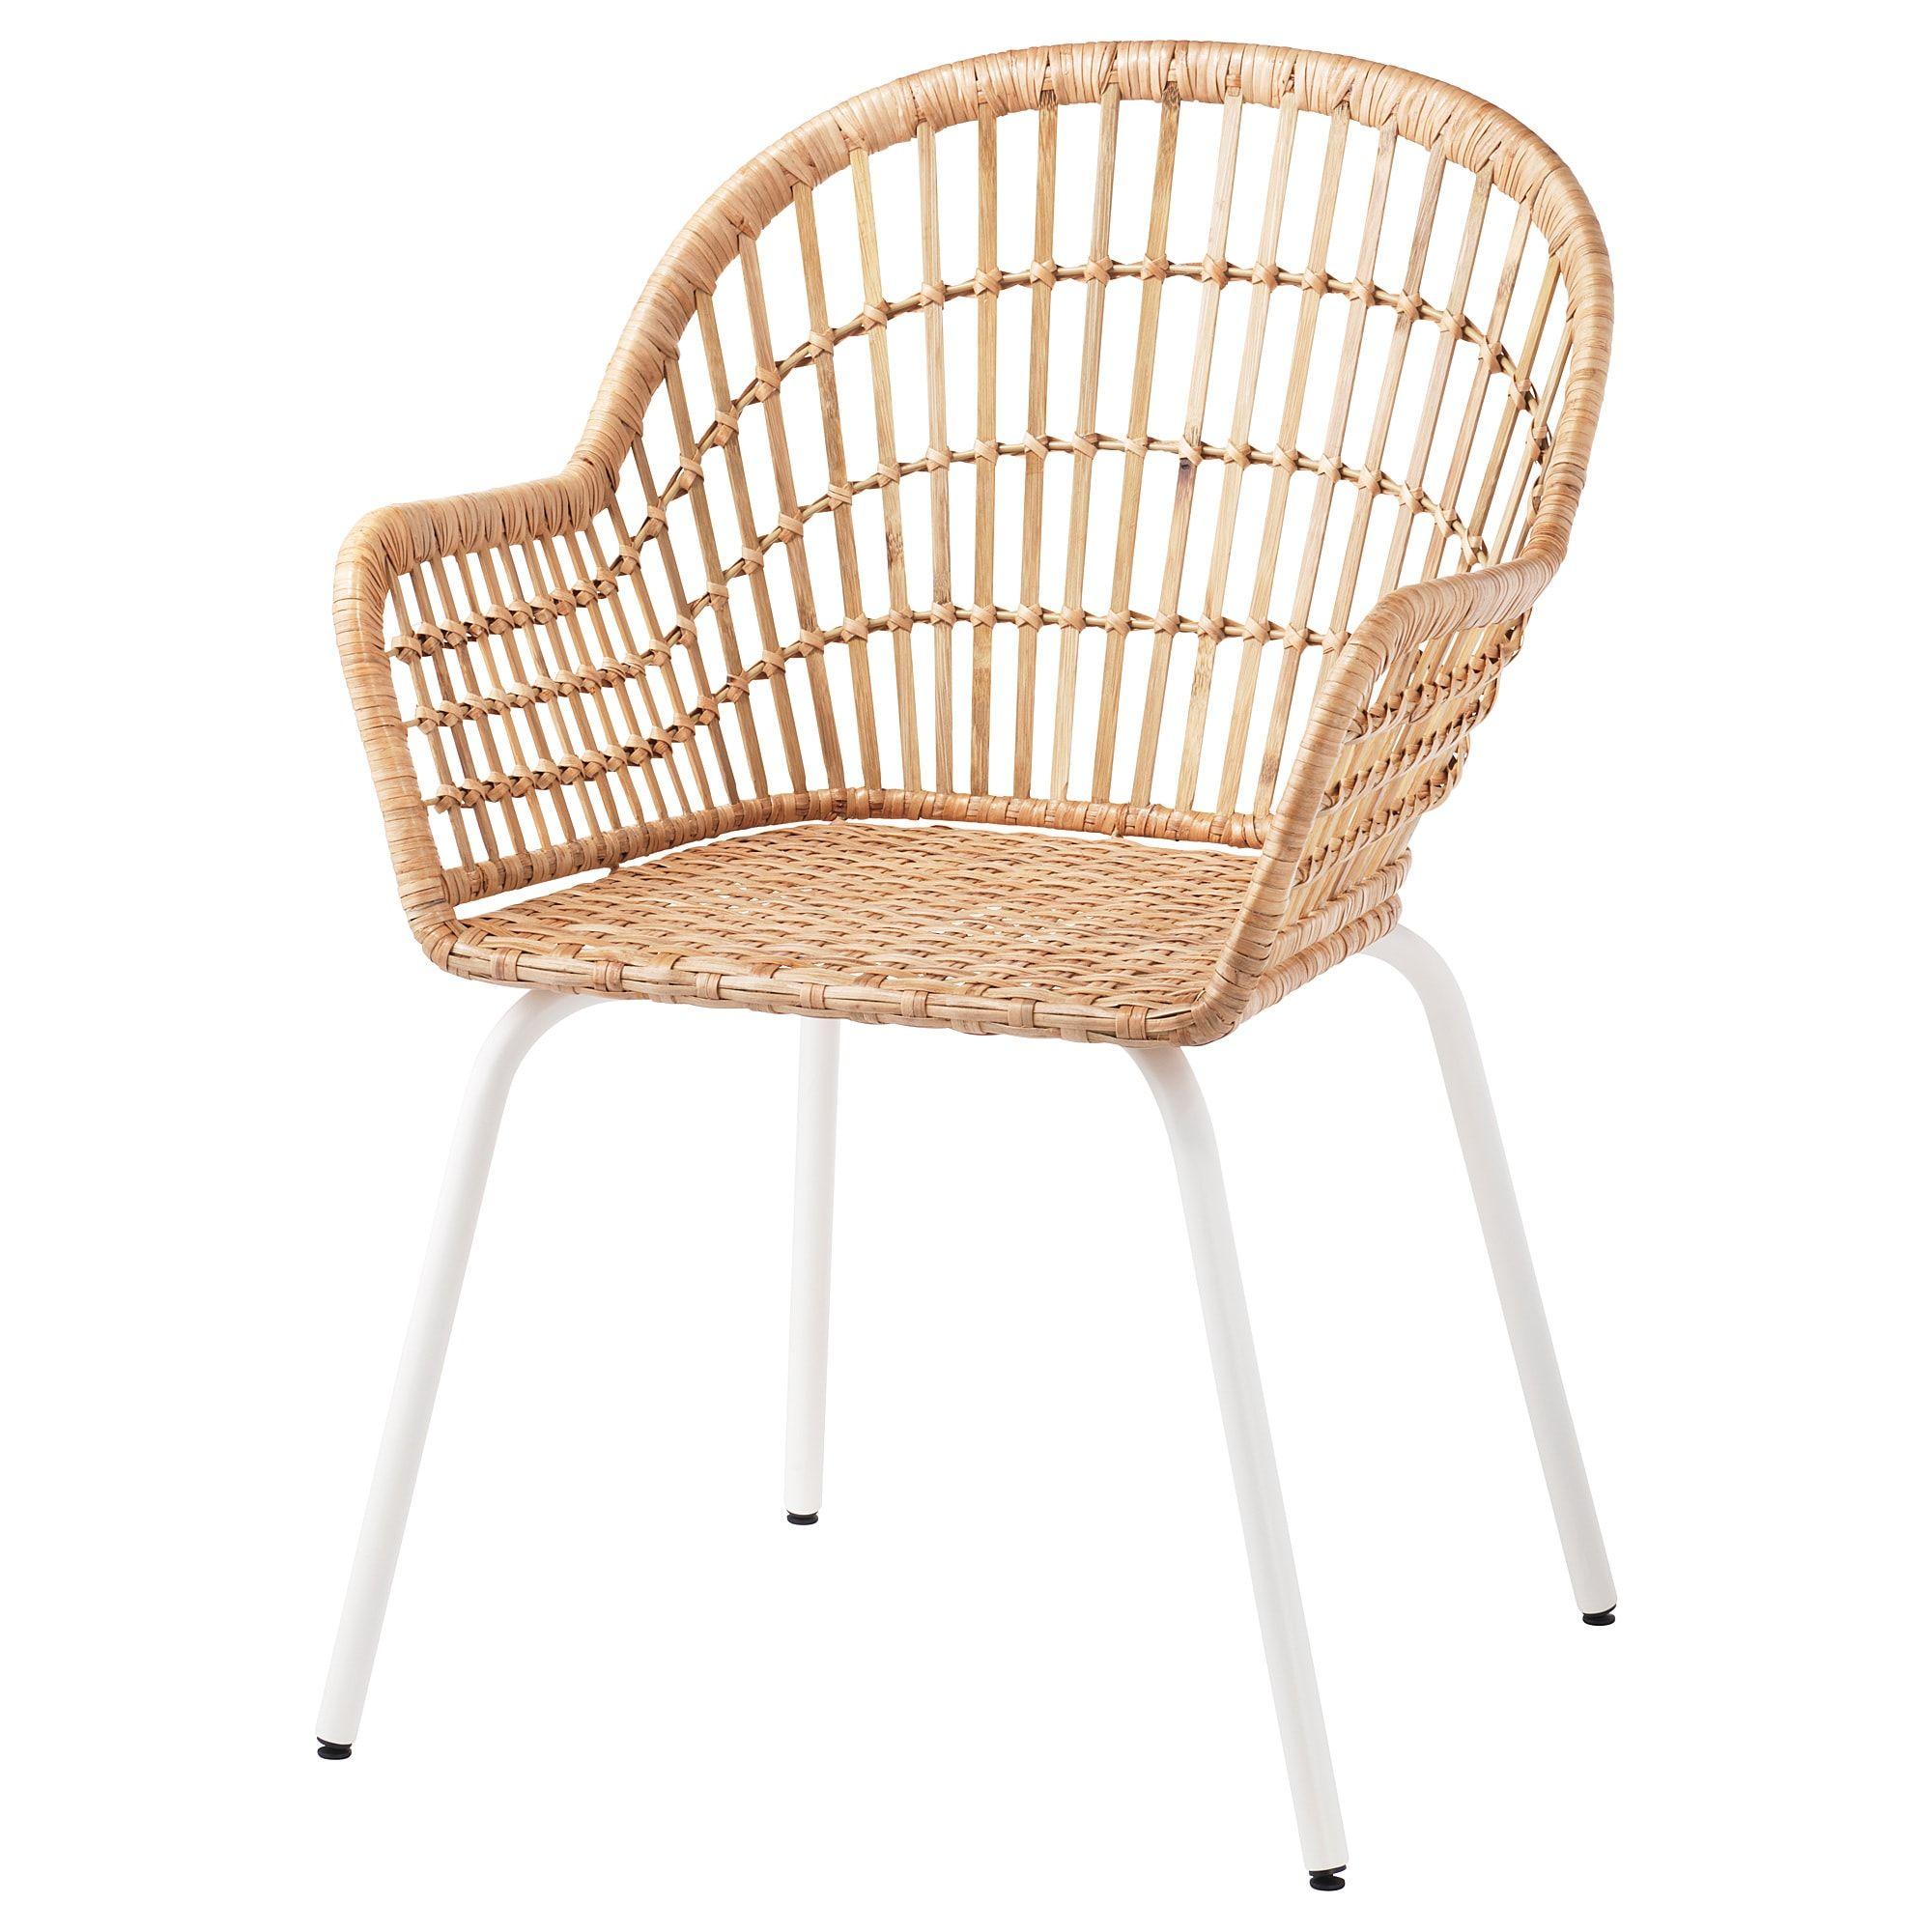 IKEA NILSOVE Rattan, White Armchair Rattan furniture